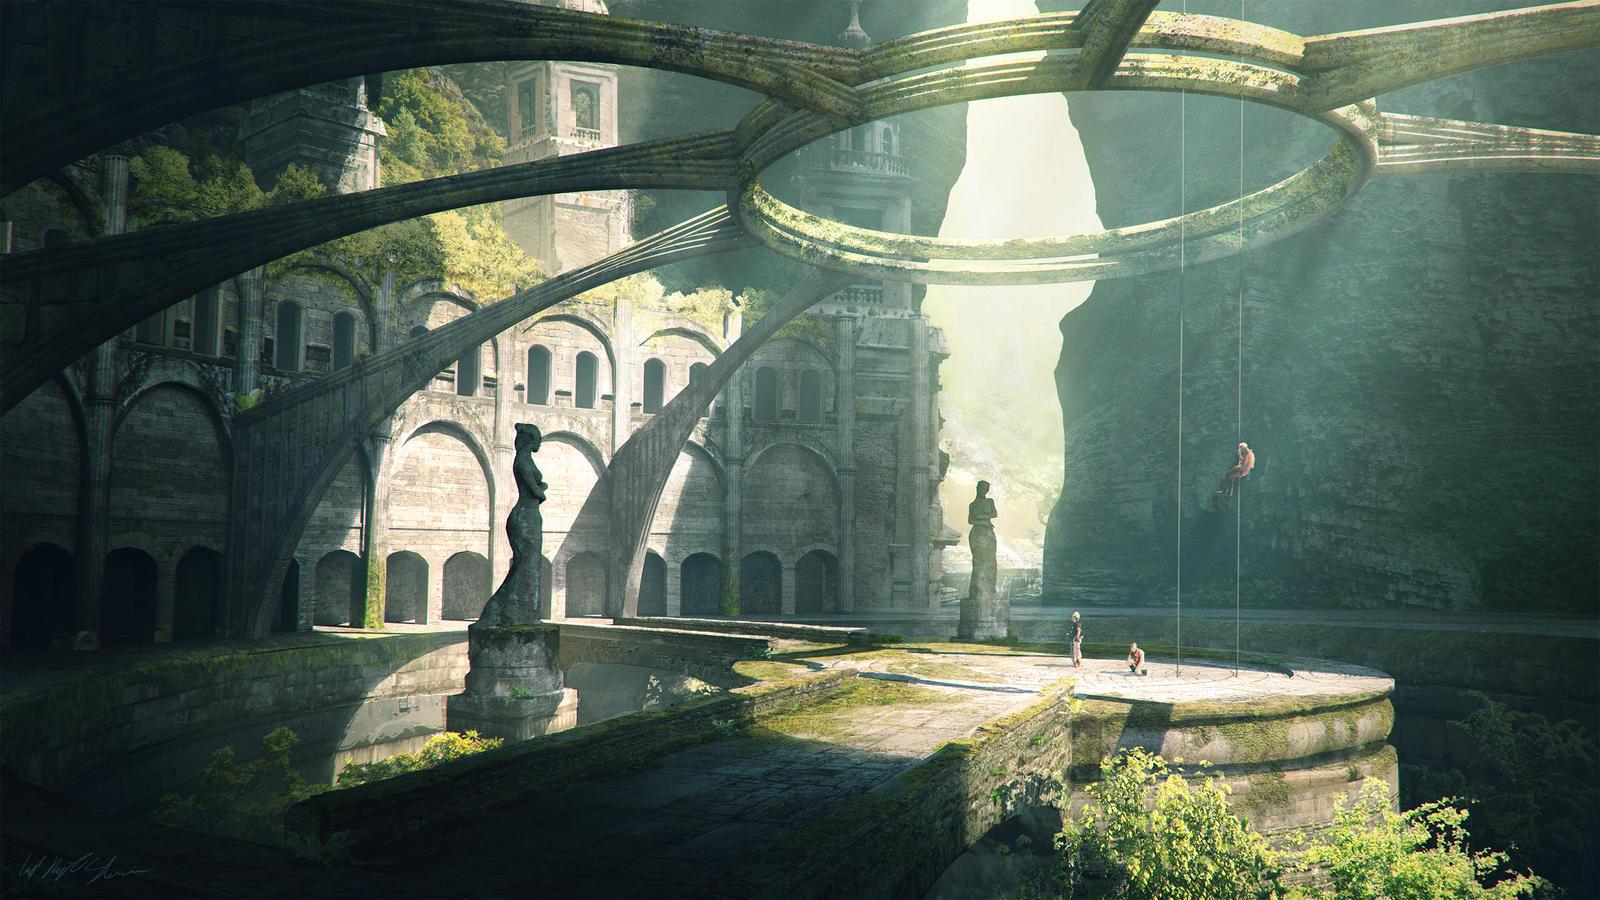 Exploration of an Old World by GabrielBStiernstrom